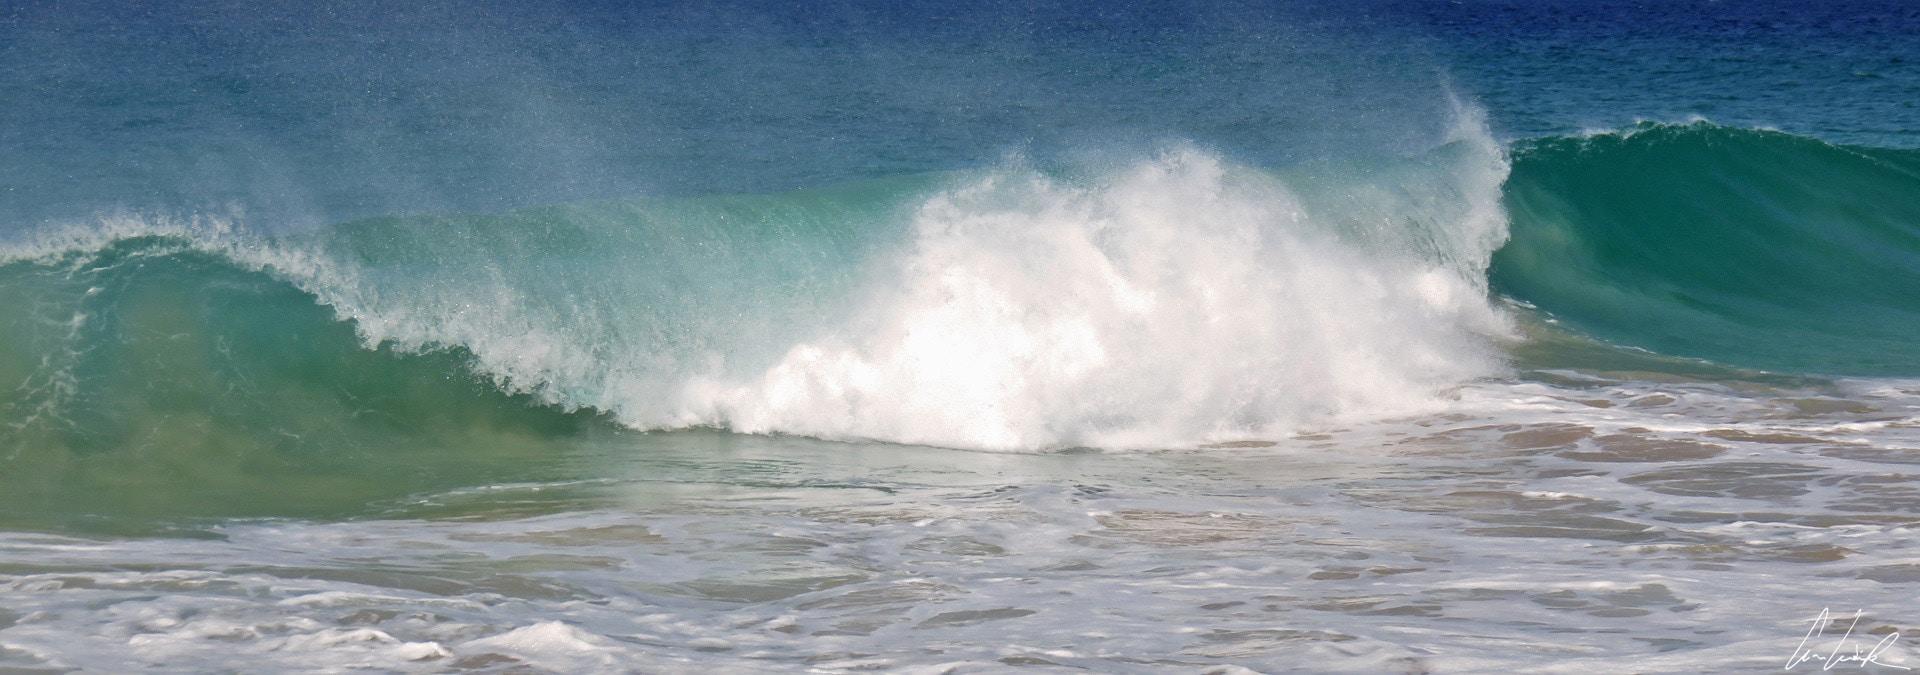 Maio - Regarder la mer